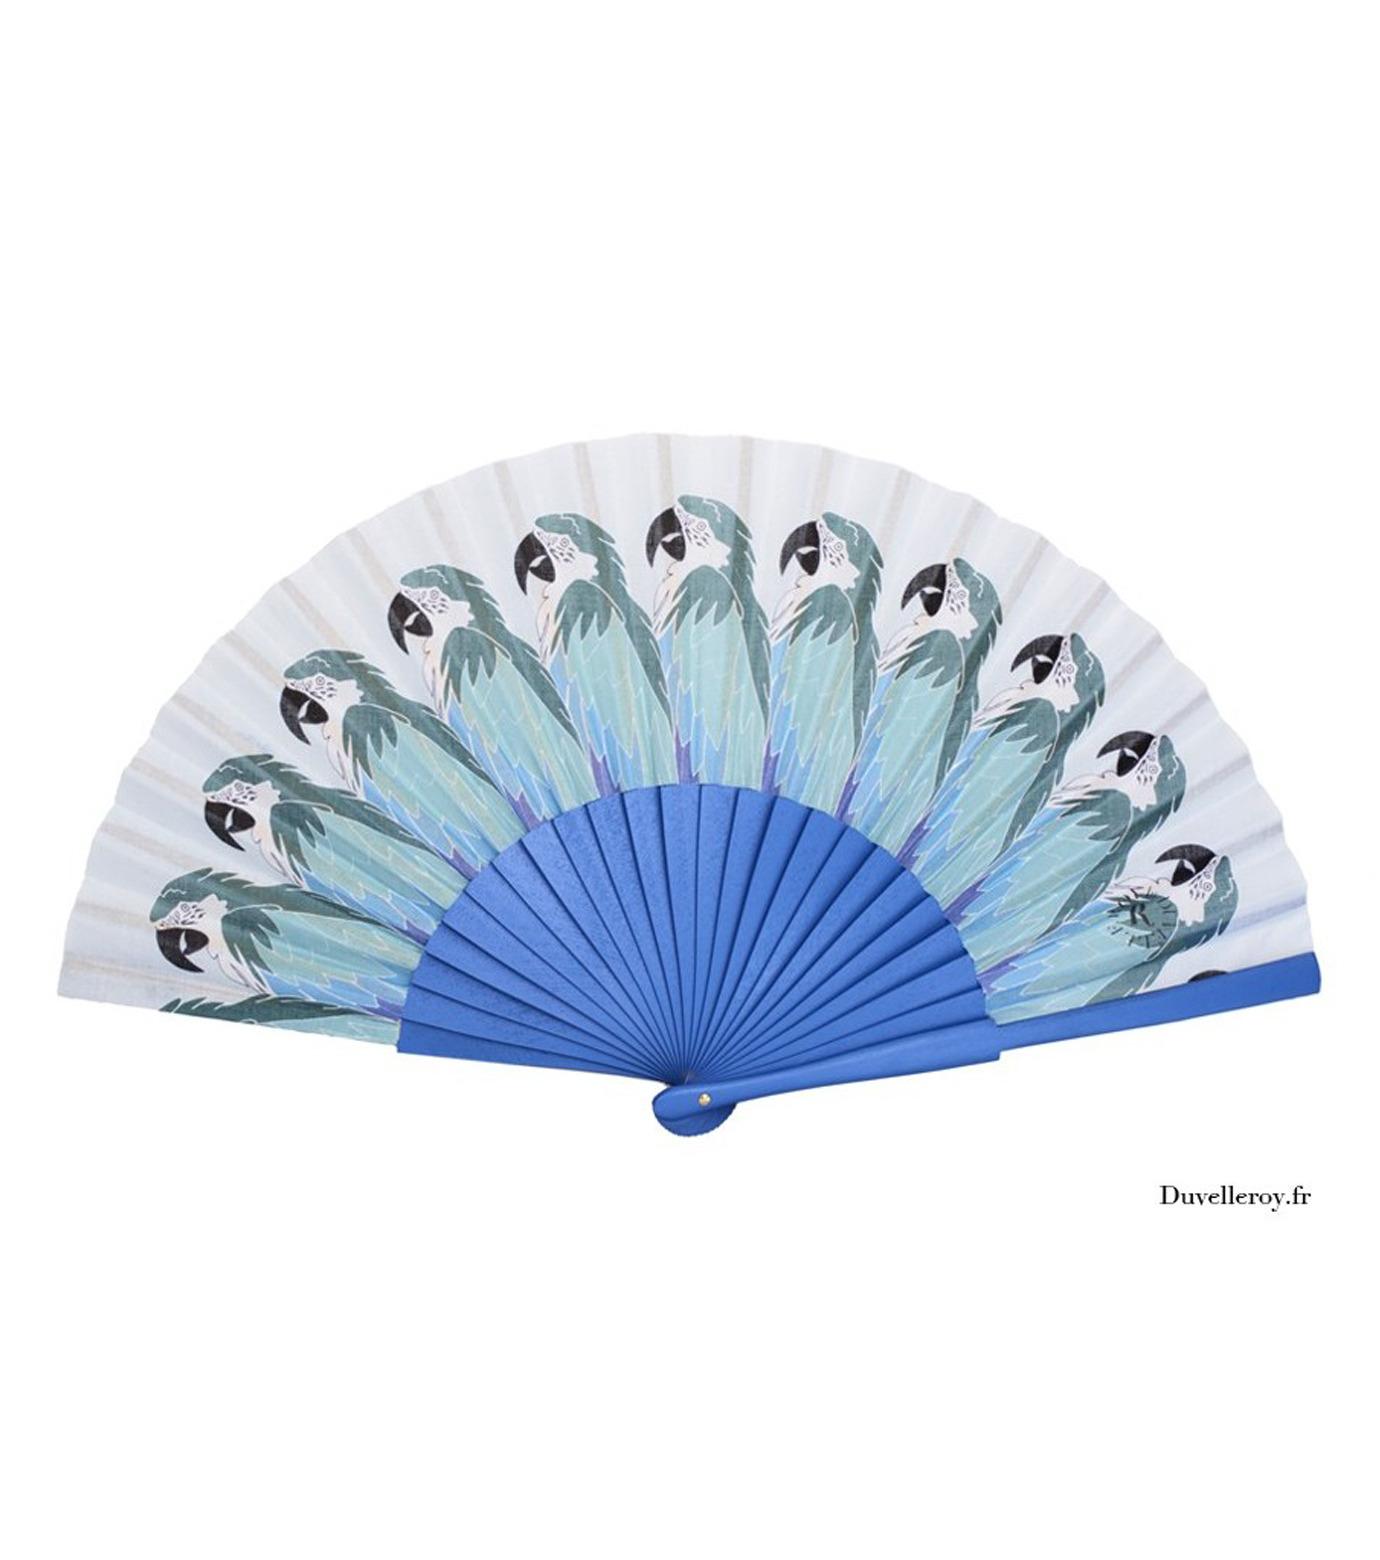 Duvelleroy(デュヴェルロイ)のBlue Parrot-BLUE(OTHER-GOODS/OTHER-GOODS)-PR01-92 拡大詳細画像1